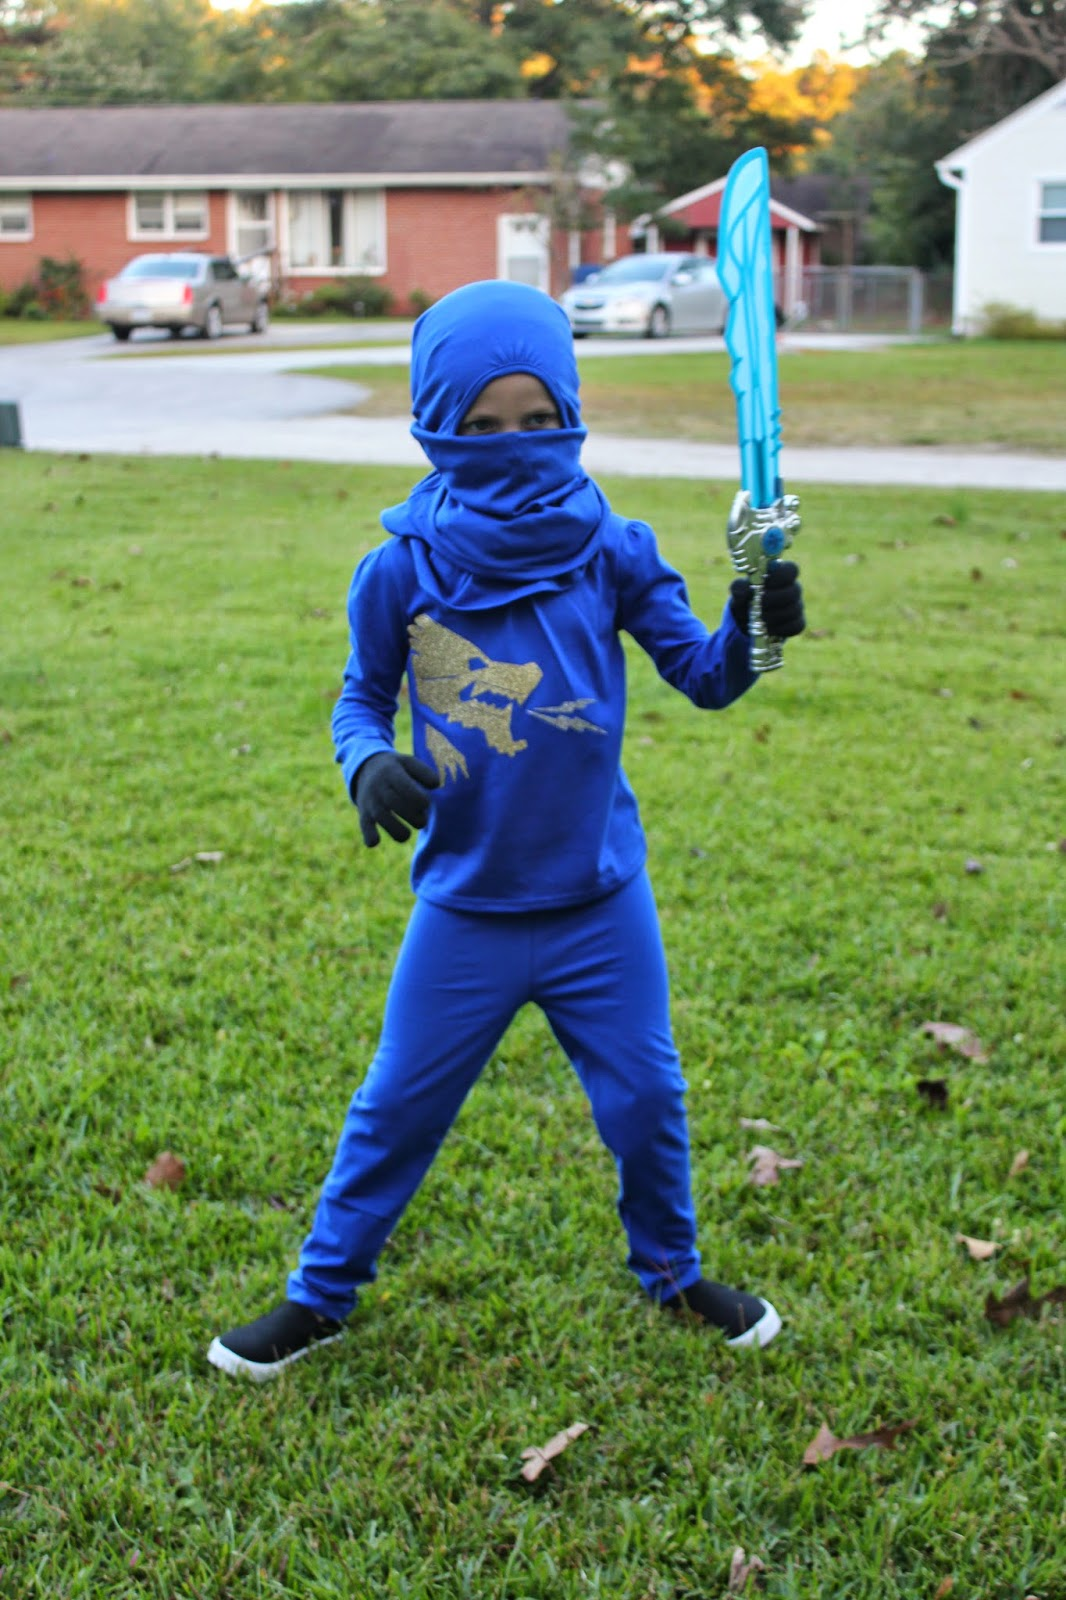 Ausmalbilder Ninjago Gesicht: Schoolhouse Ronk: Halloween 2014- DIY Ninjago Costumes